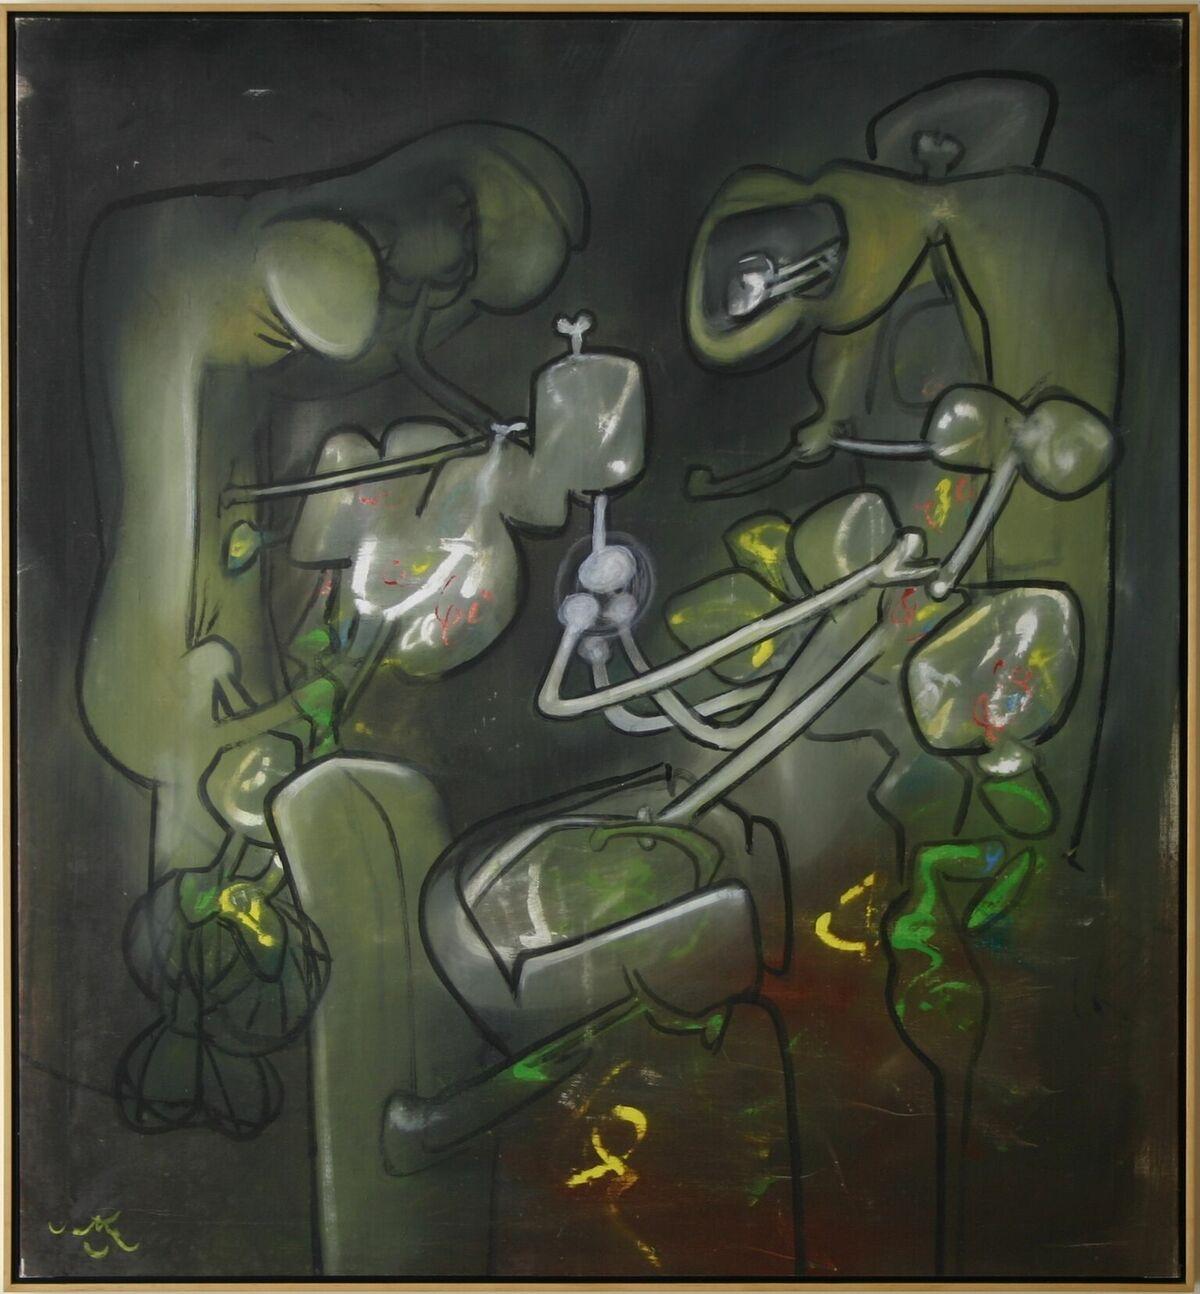 Roberto Matta (1911-2002)   Flash of Flesh , 1971  Oil on canvas 53 x 49 inches; 134.6 x 124.5 centimeters